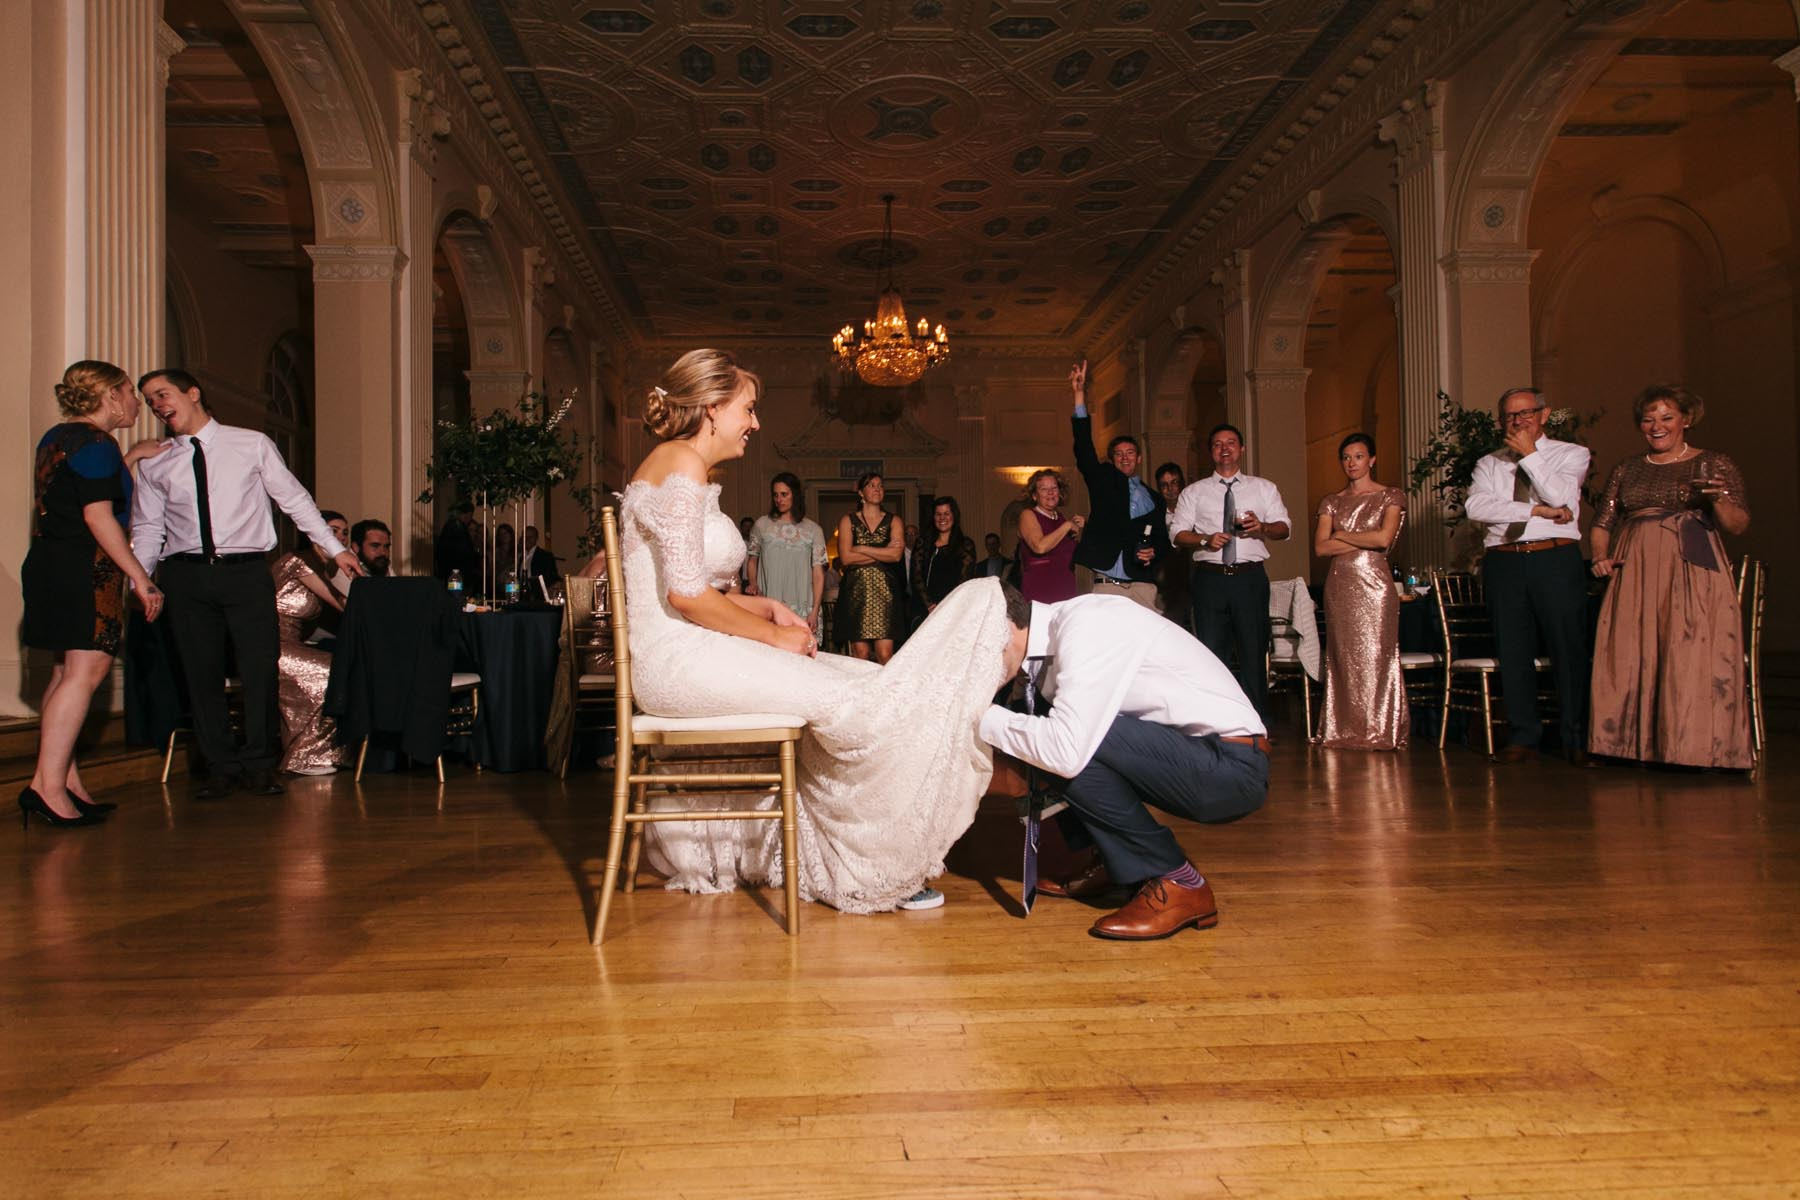 kjellman wedding blog biltmore wedding -125